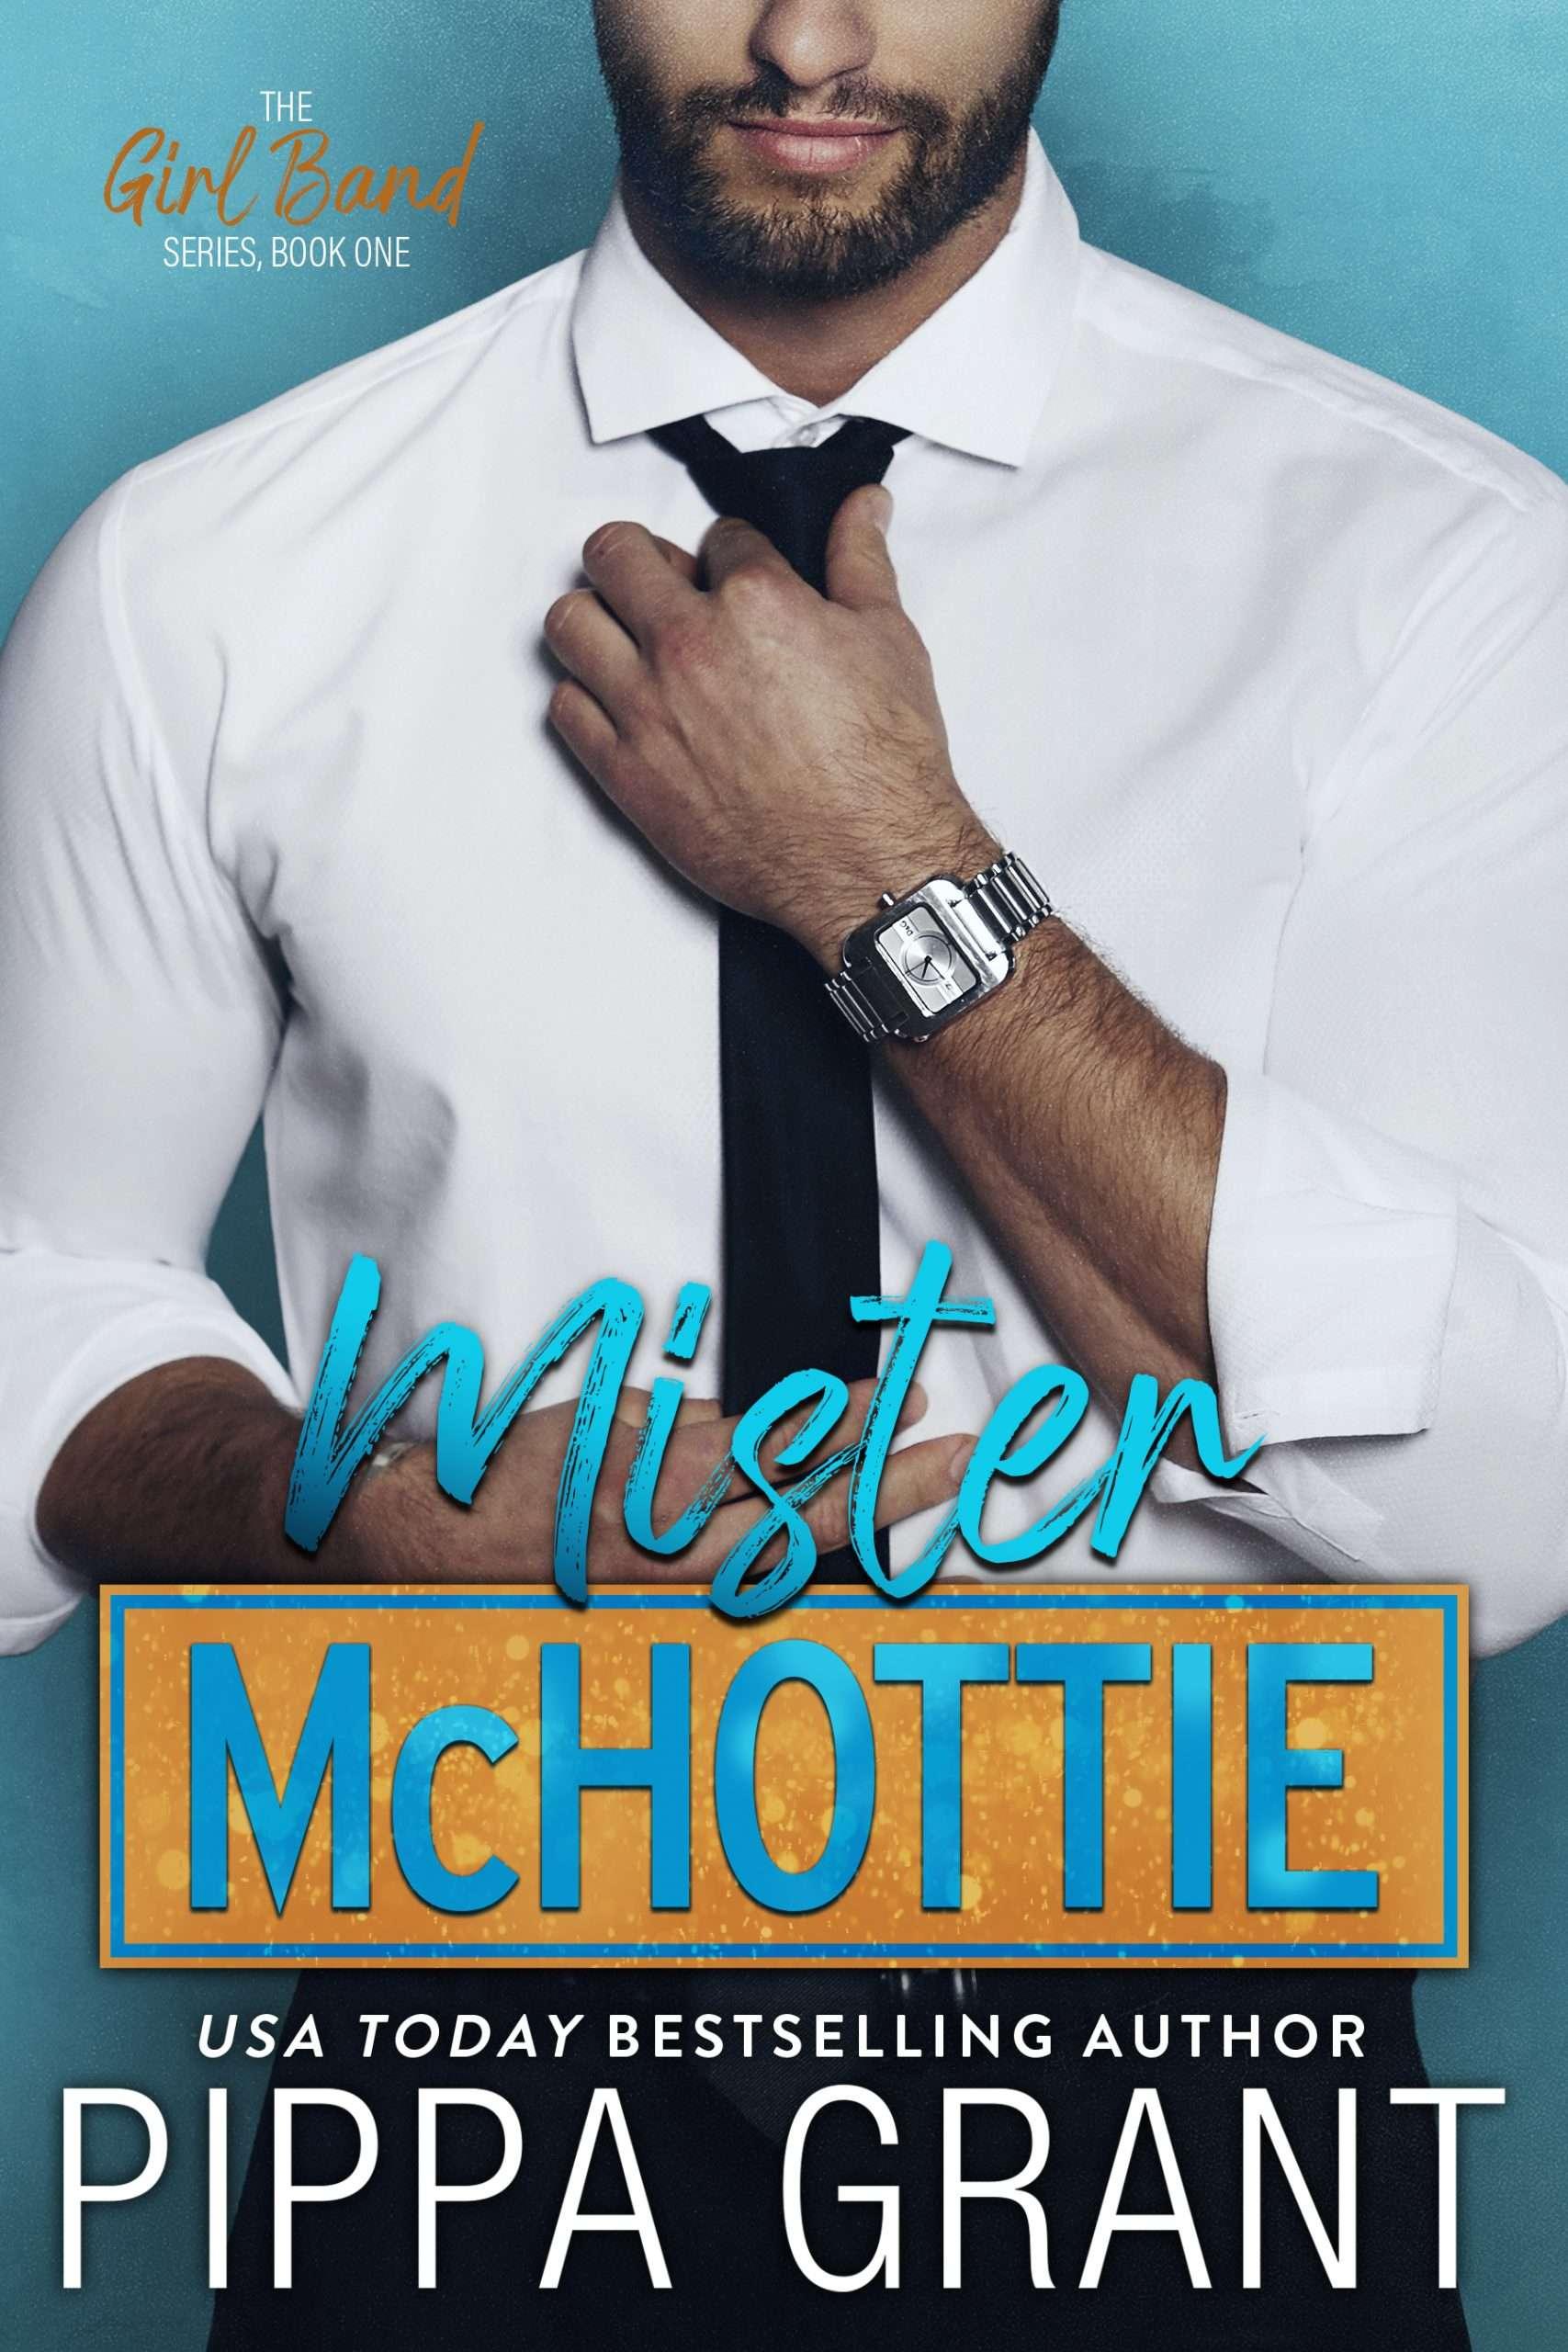 MisterMcHottie_Ebook